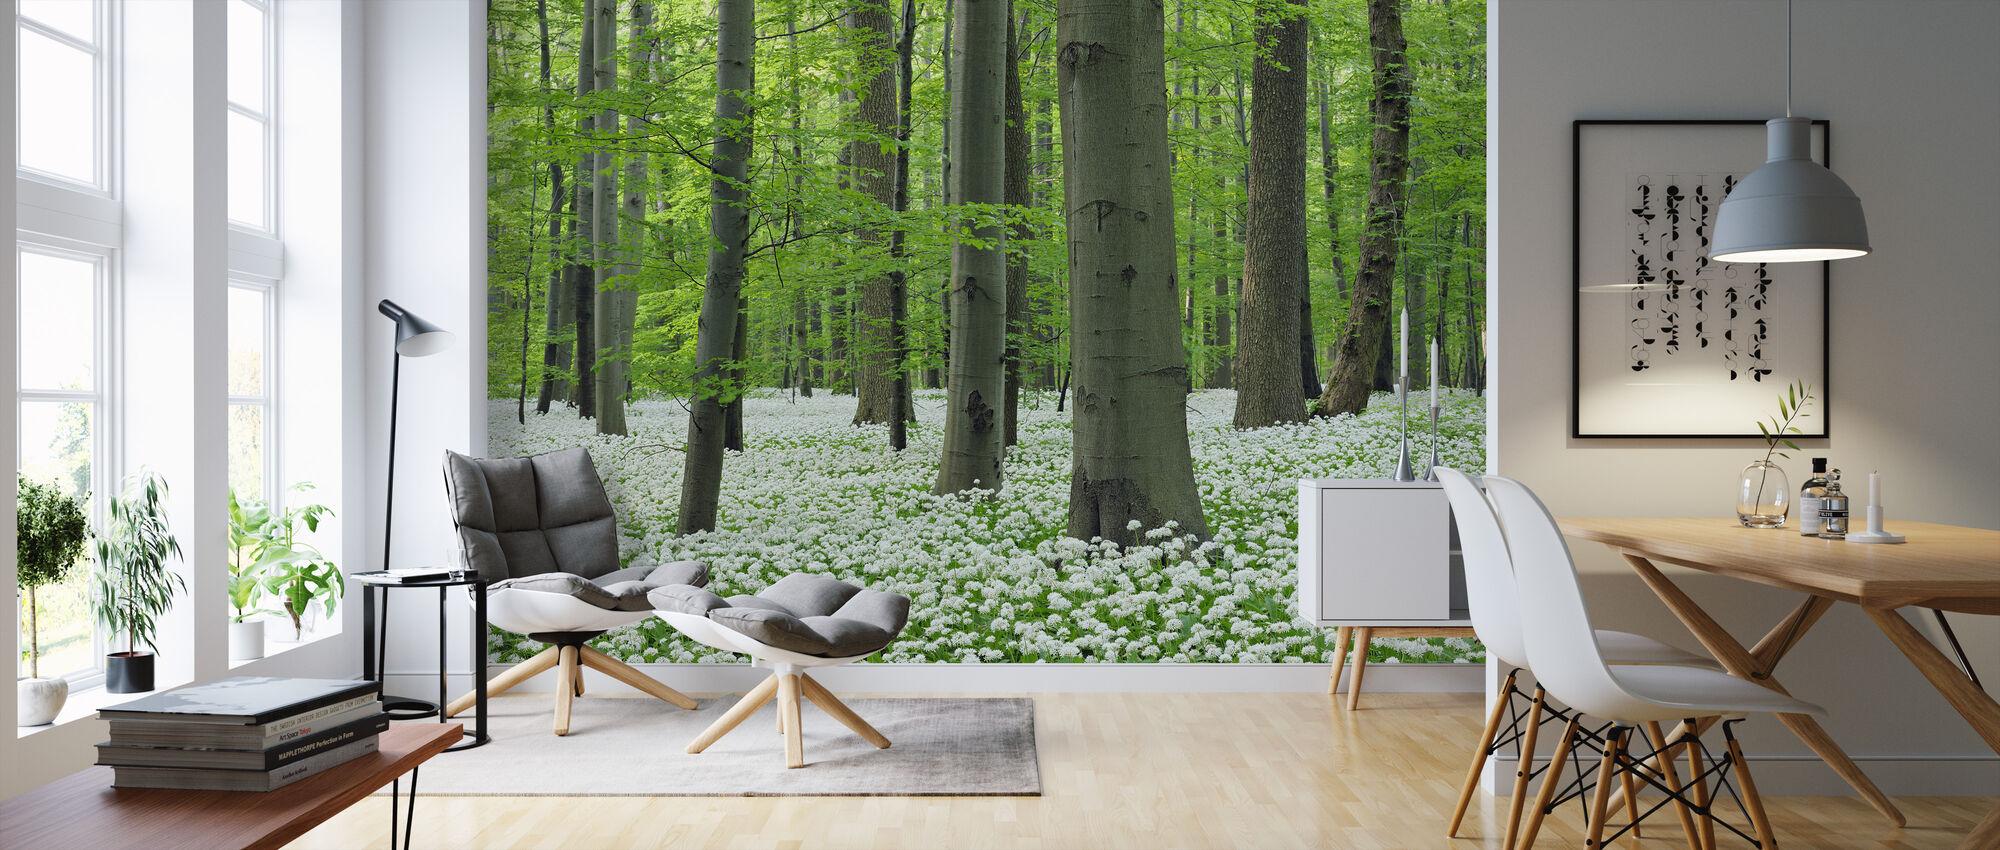 Ramsons skog - Tapet - Vardagsrum